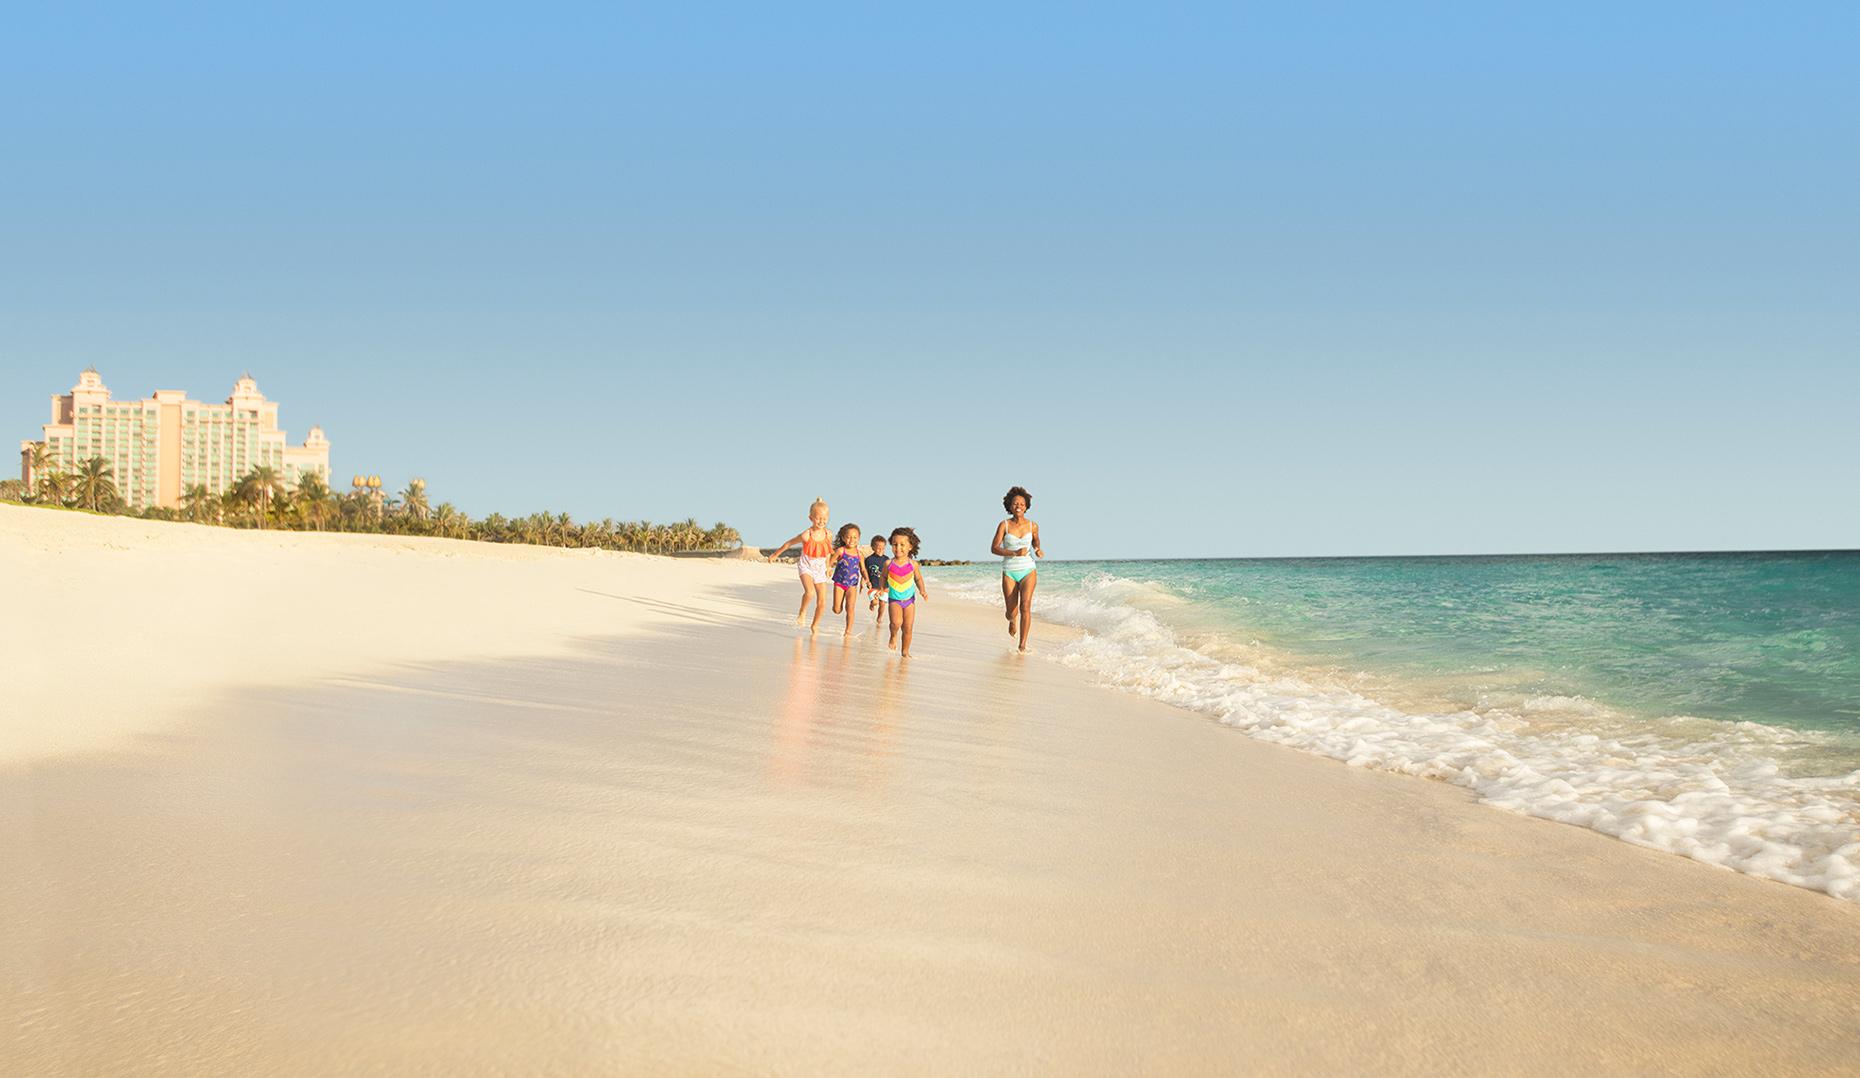 14-BeachTower-1136-1web.jpg